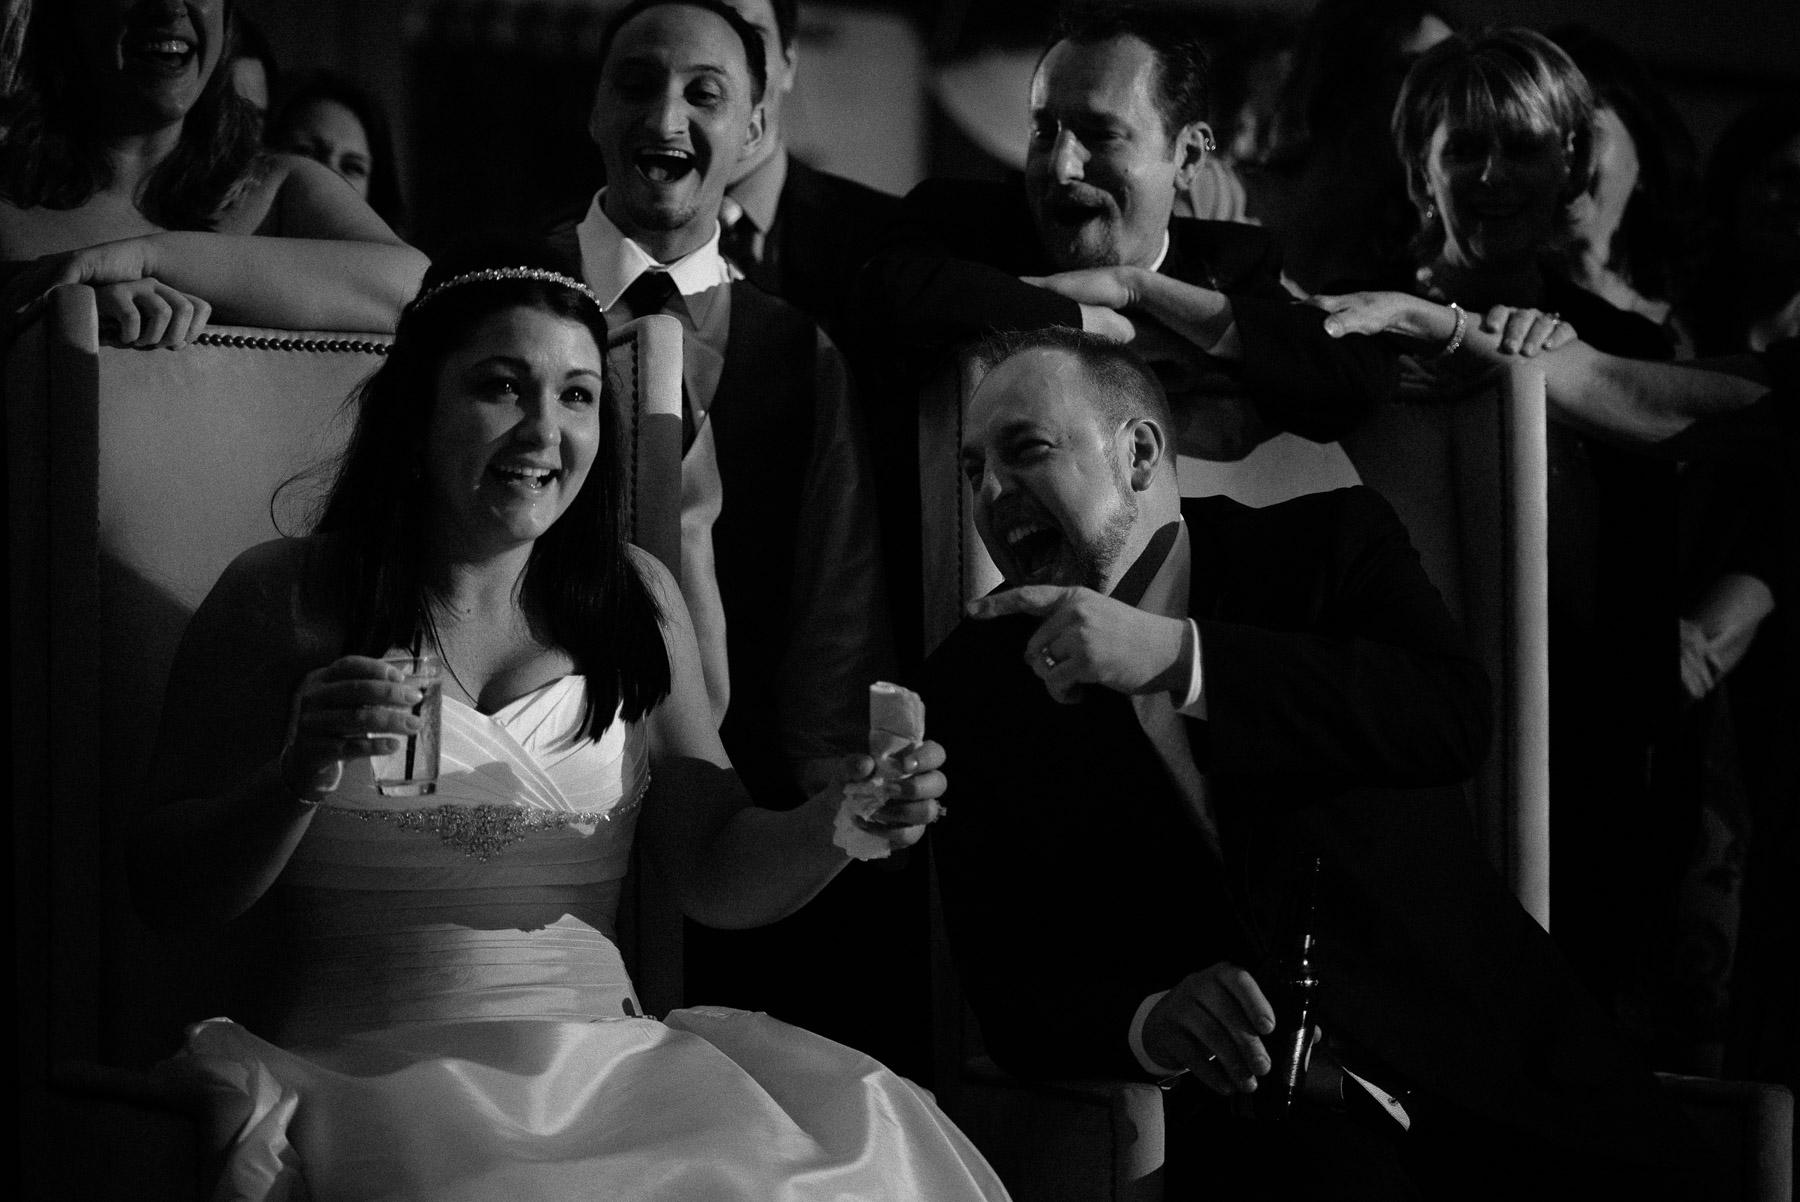 south gate manor wedding photos